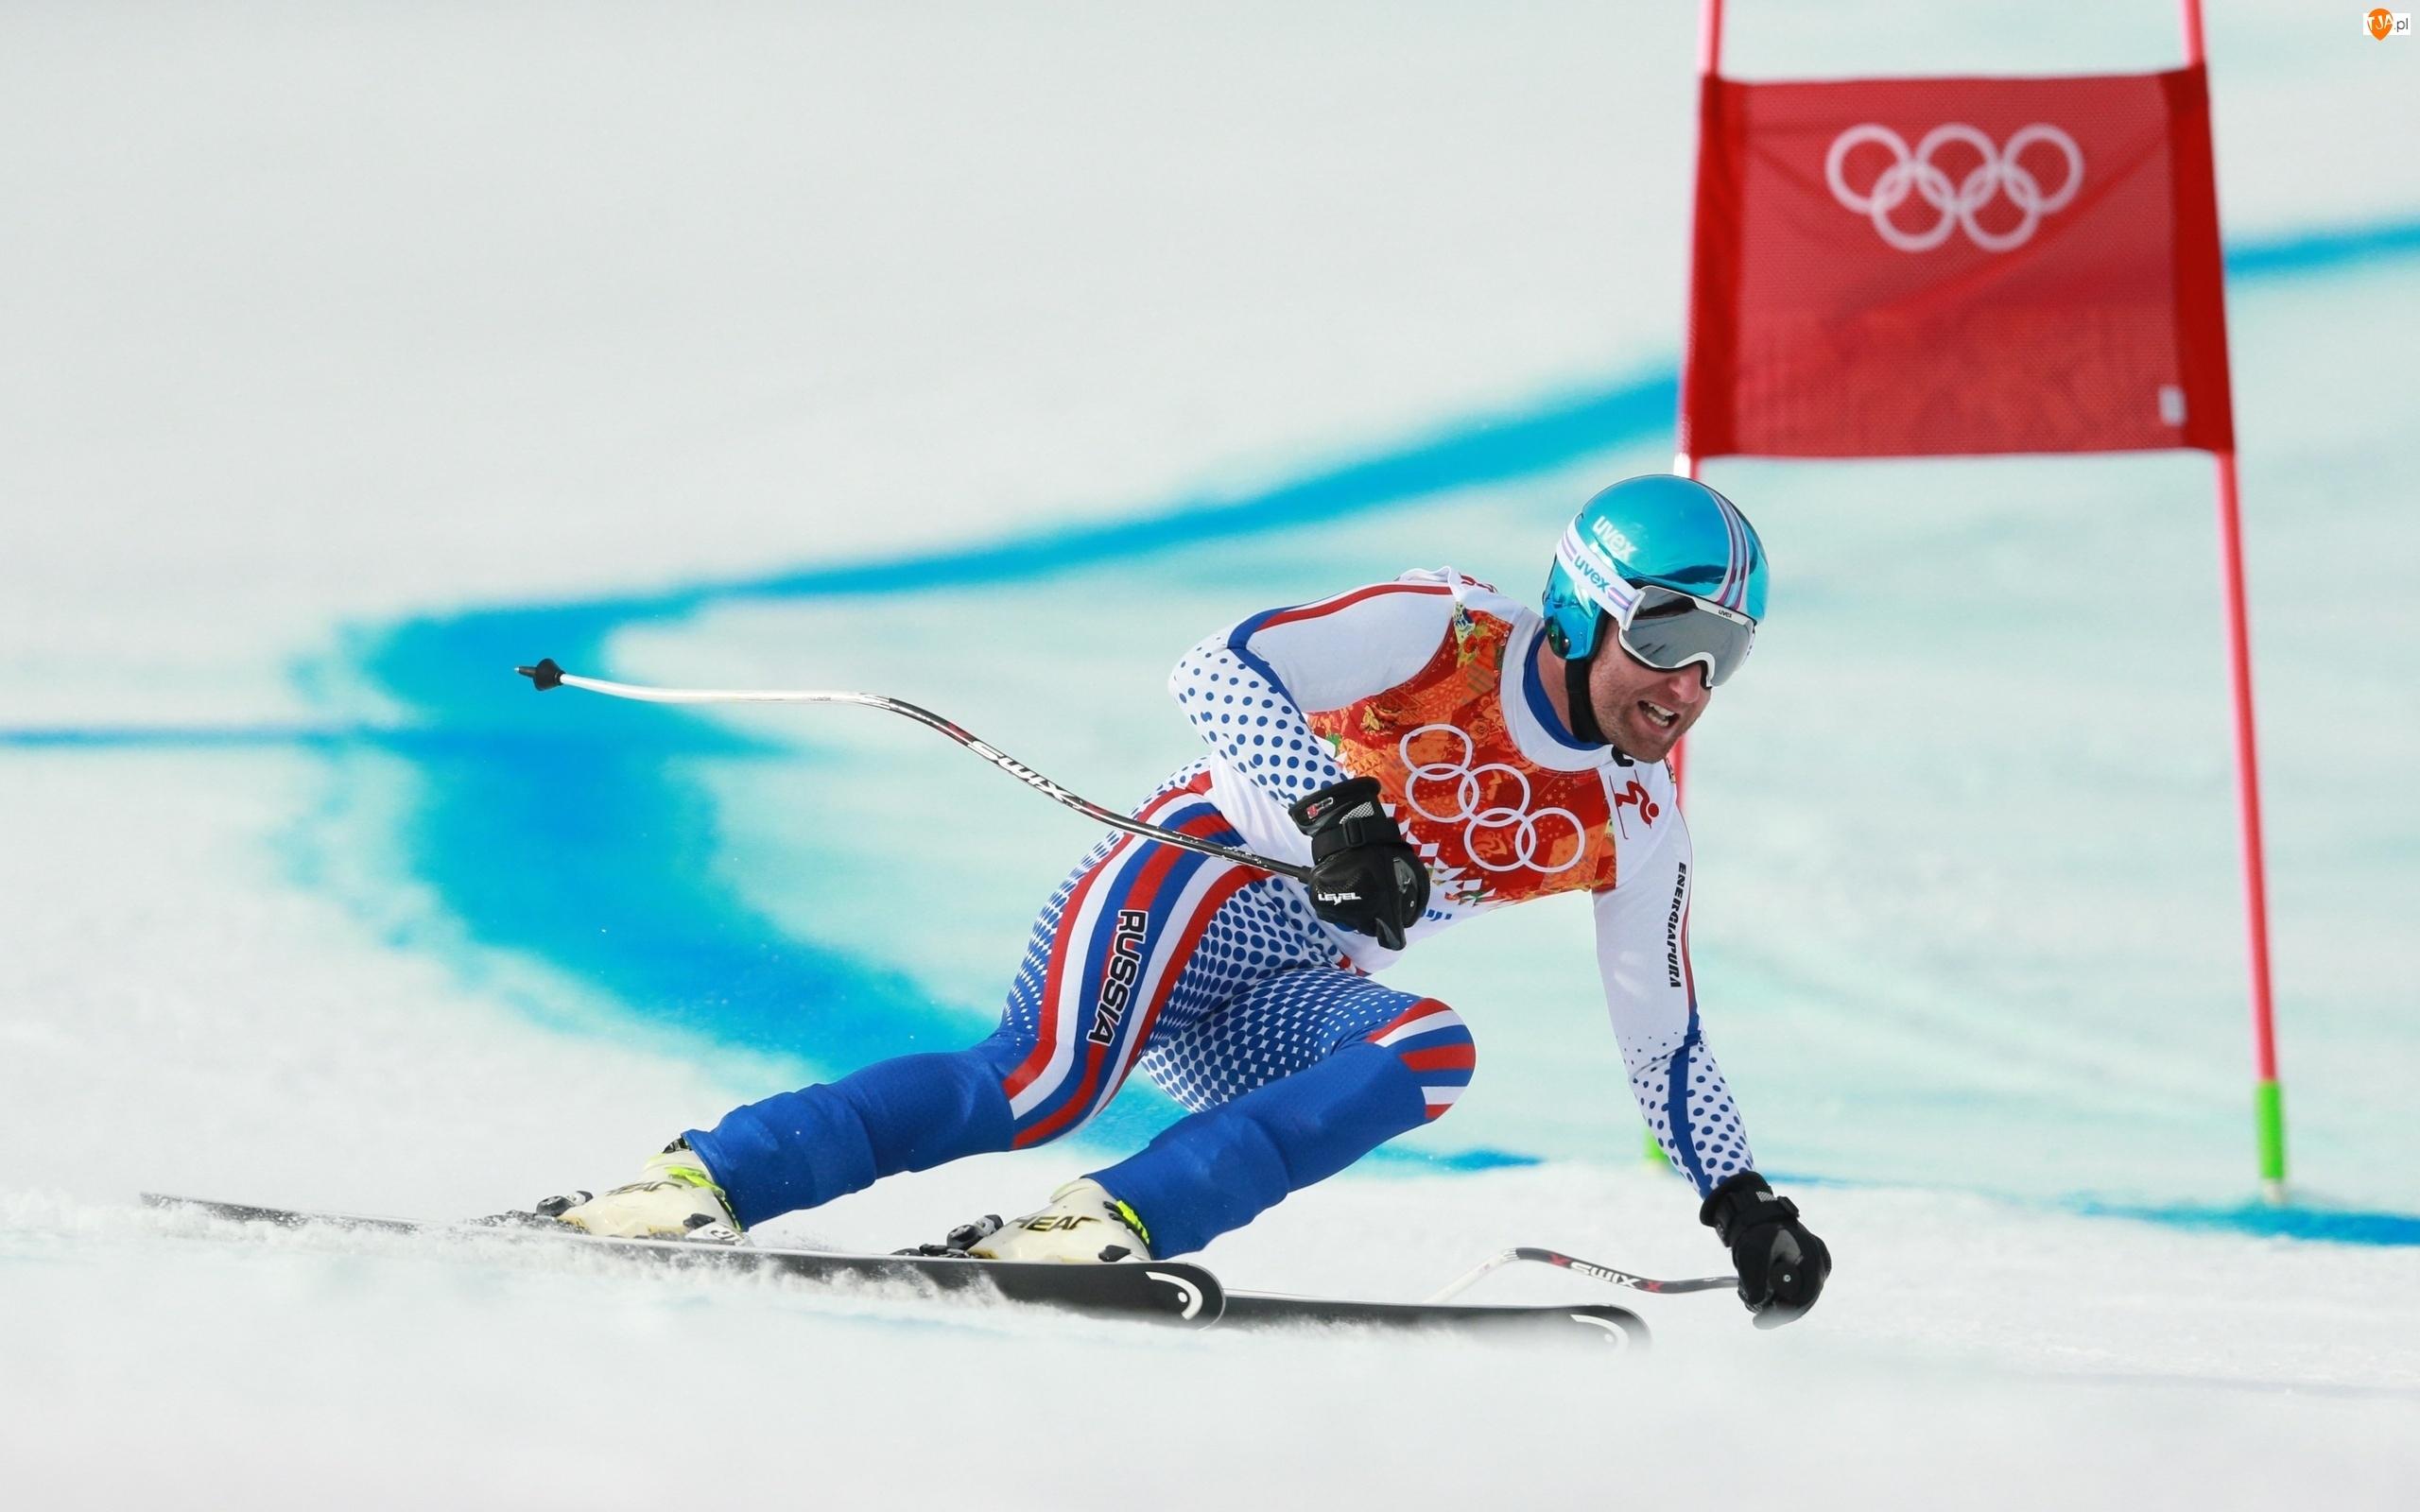 Sochi 2014, Narciarz, Olimpiada